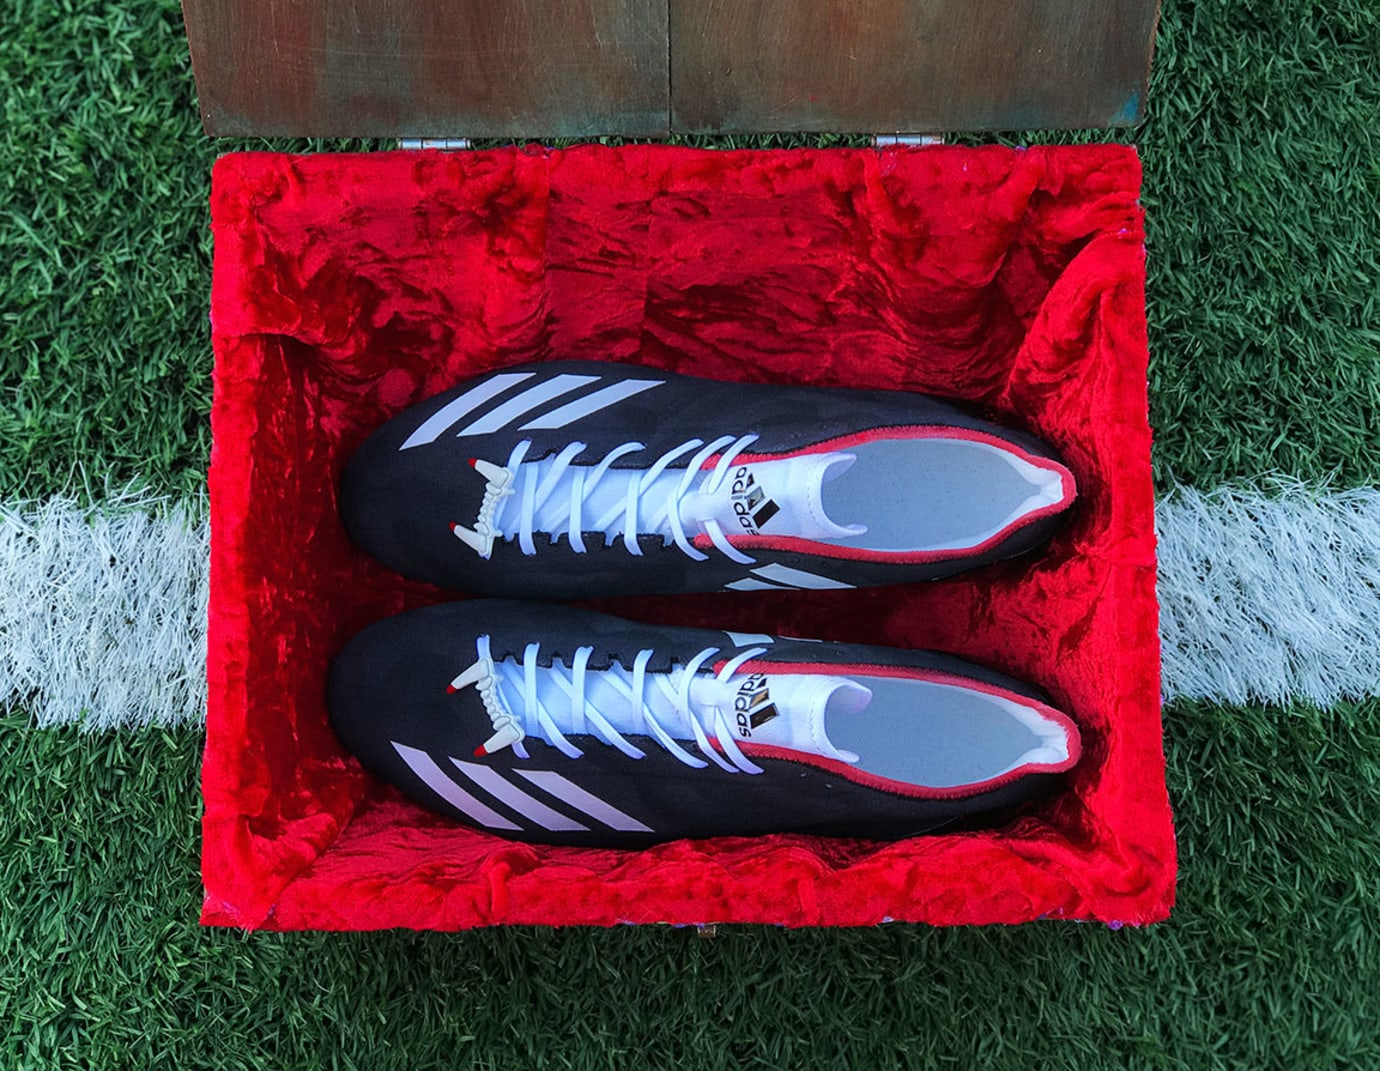 Adidas Adizero Josh Norman Halloween Cleats Top